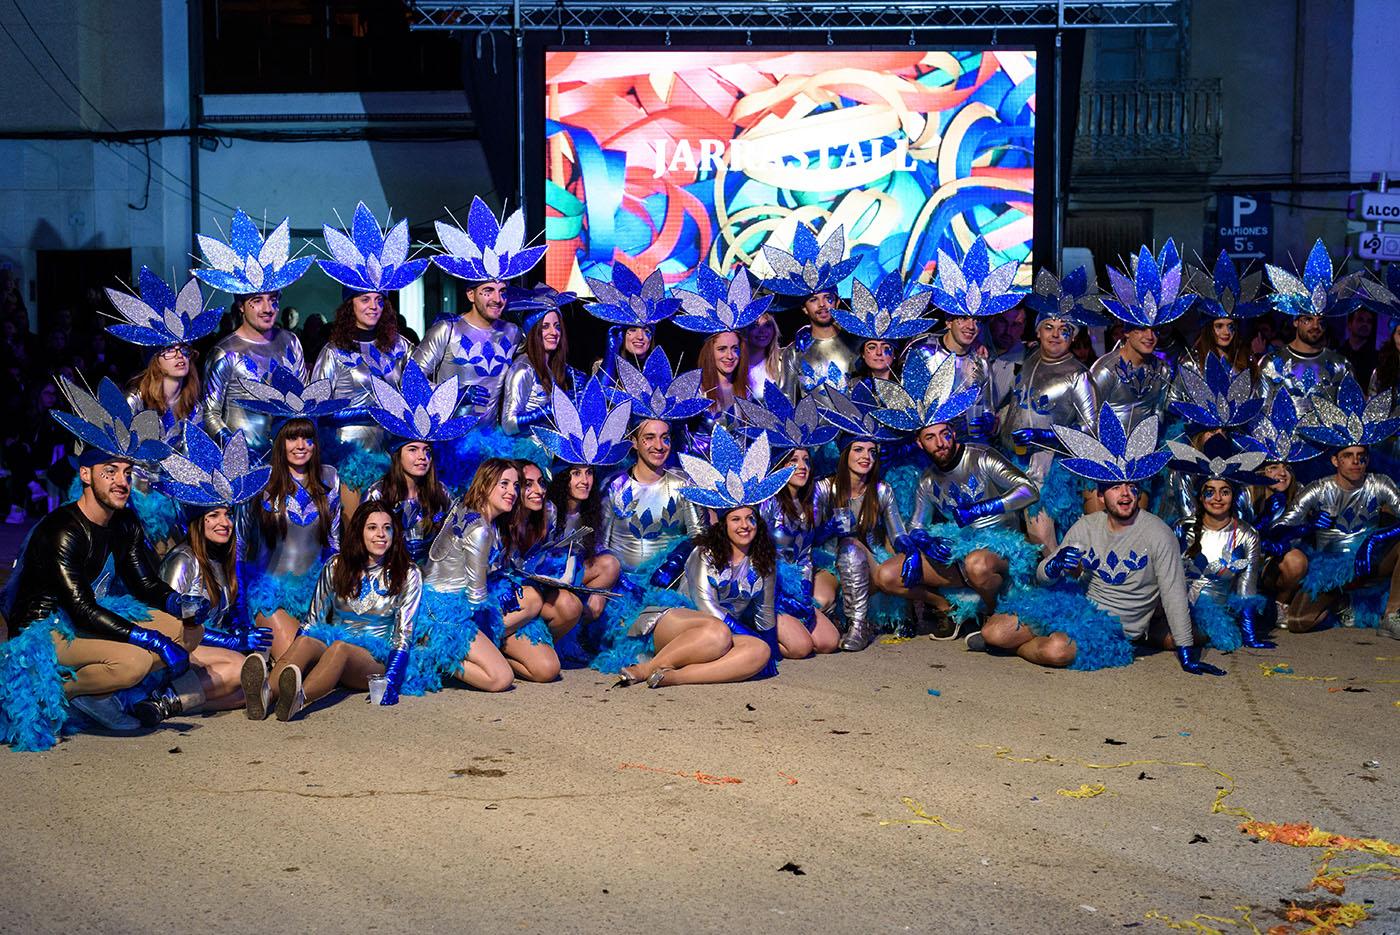 Turismo-Alcossebre_Carnaval_Alcala_de_Xivert_Comparsa_Azul